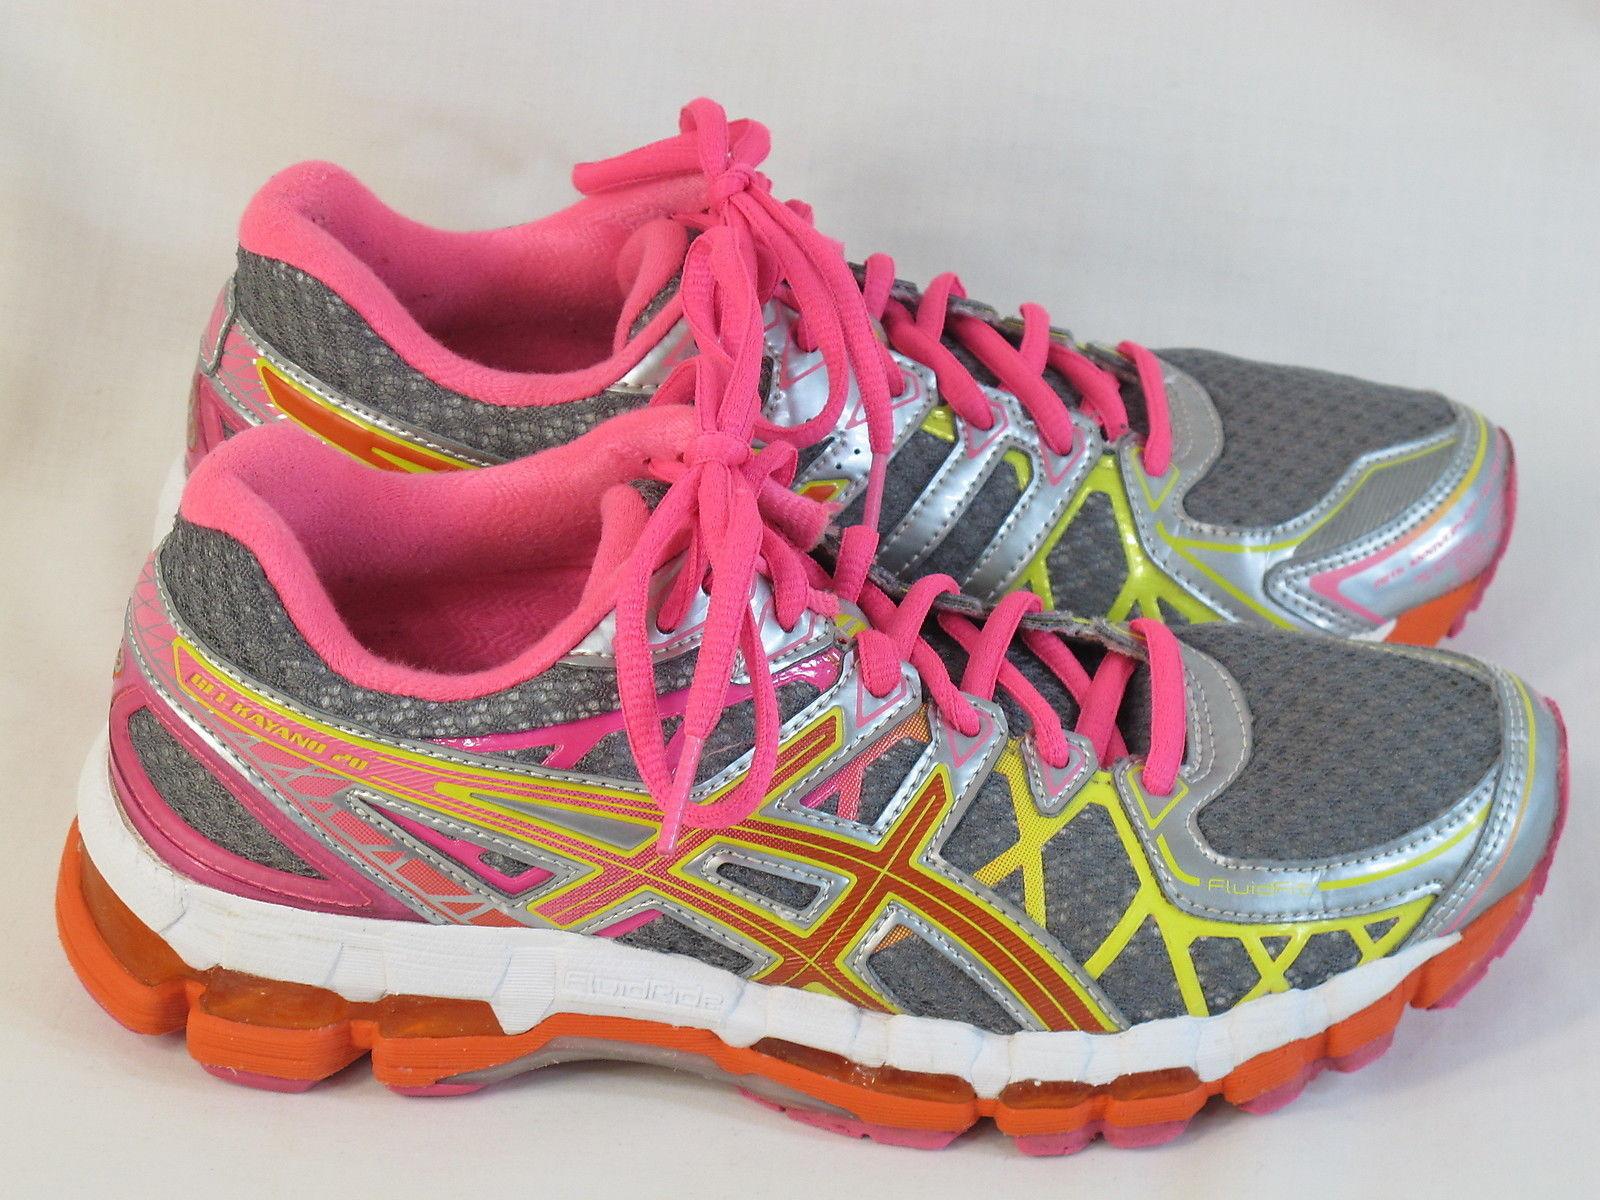 Details about Asics Gel Kayano 20 Womens Shoes Running Walking Training Comfort Black Size 8.5